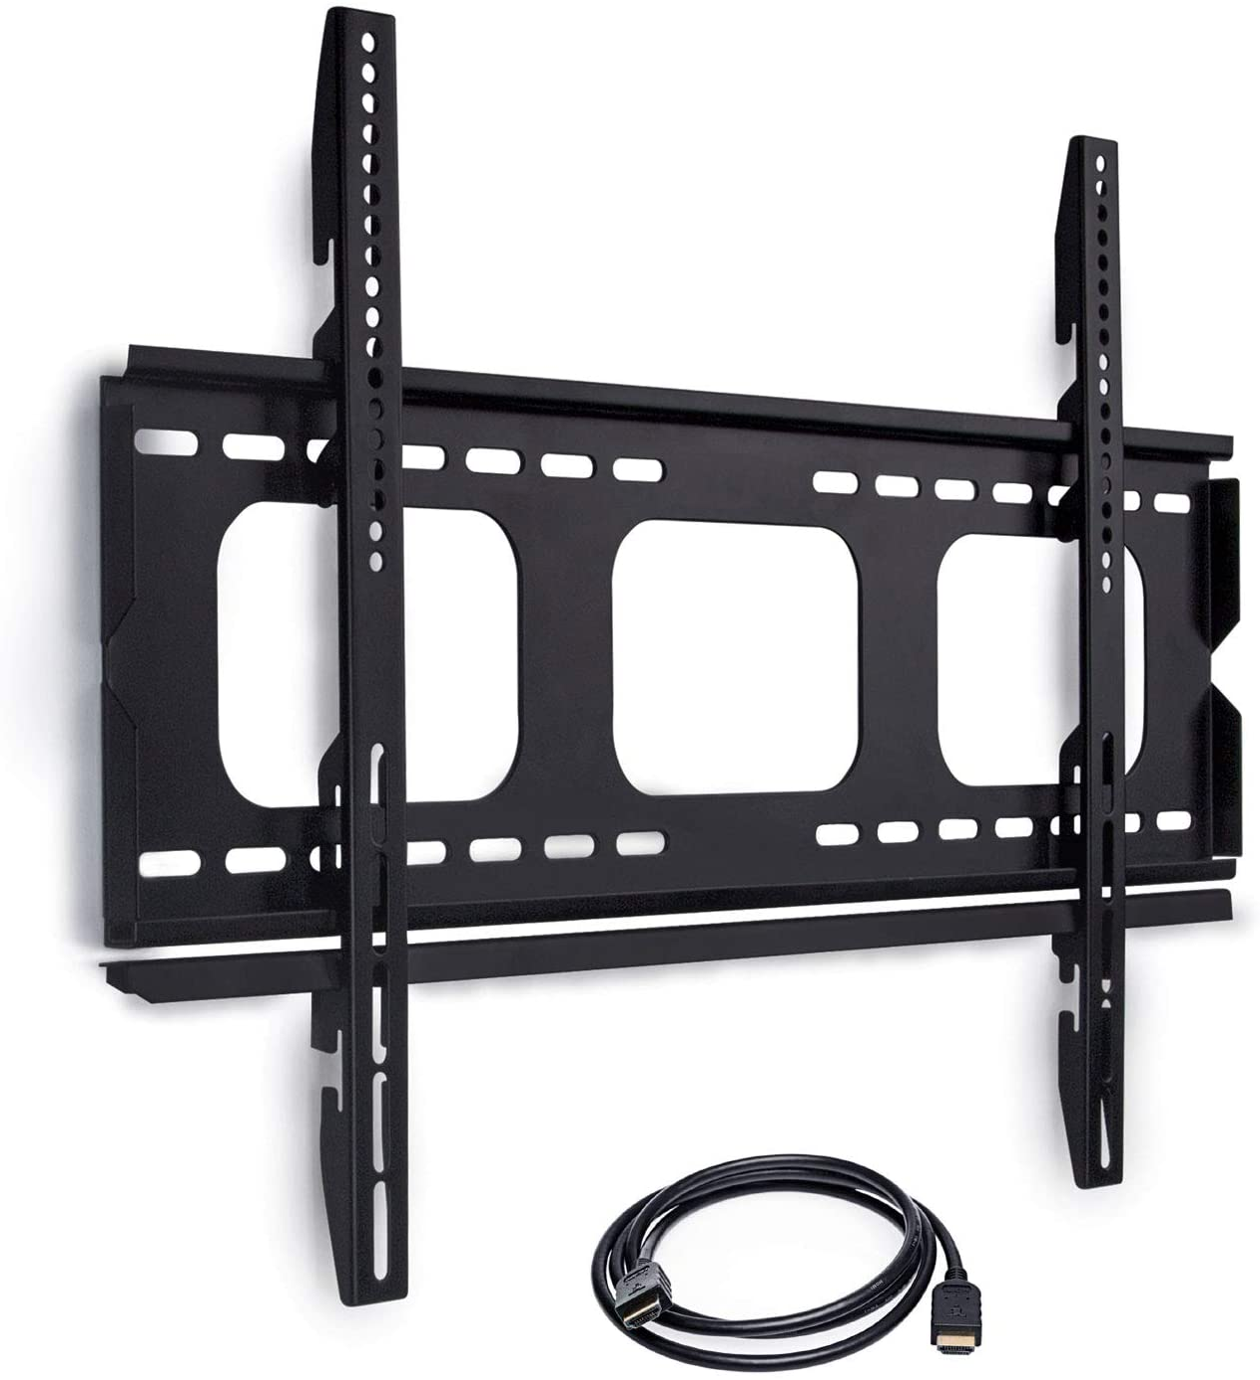 Mount-It MI-305B Locking Wall Mount for Samsung, Sony, LG, Sharp, Insignia, Vizio, Toshiba, Sharp, TCL, Westinghouse, 4K, 32, 40, 42, 48, 49, 50, 52, 55, 60 TV Monitor, VESA 770×480, 6ft HDMI Cable